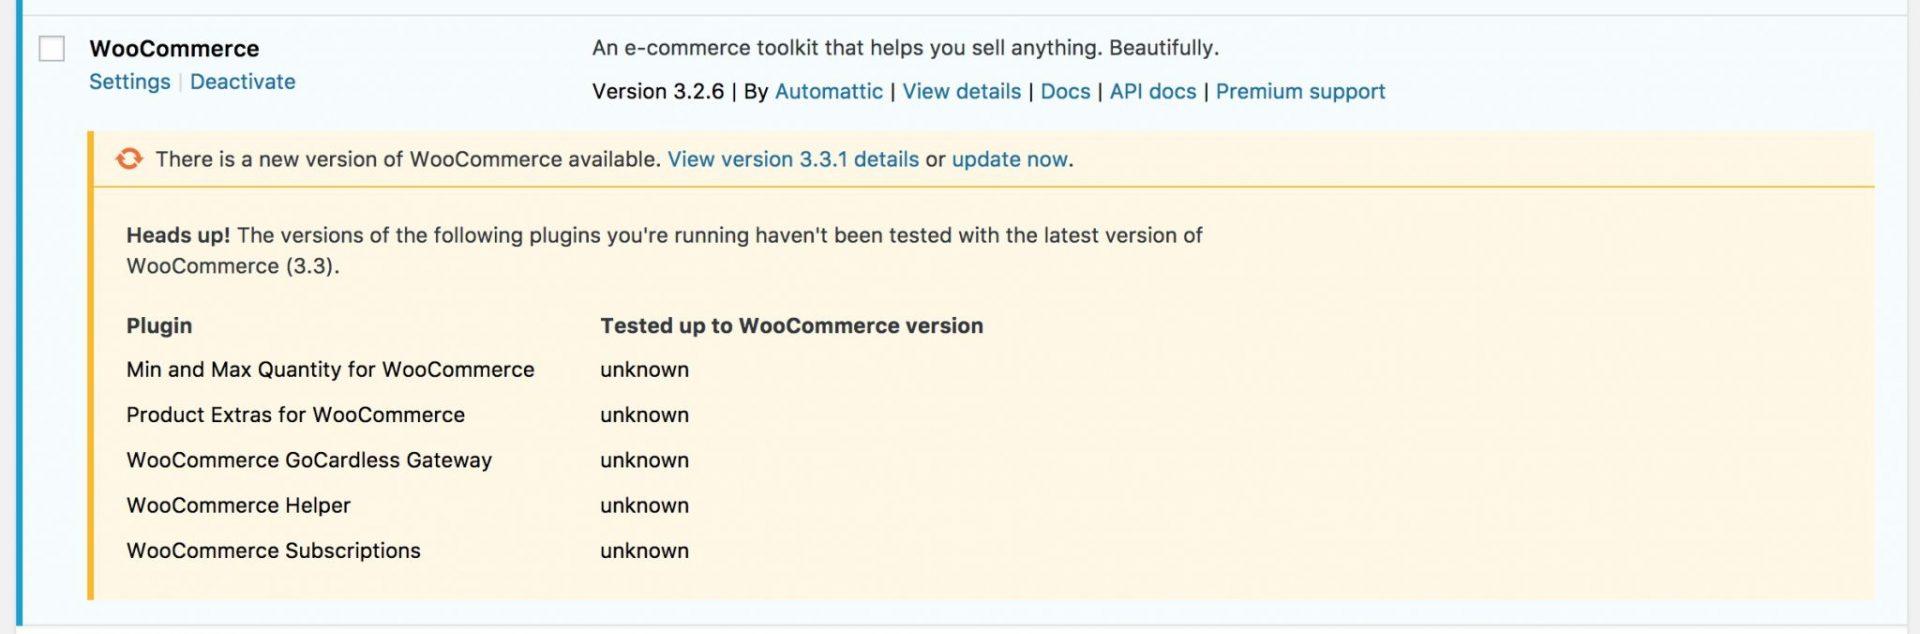 wordpress-plugin-update-notice-1920x634